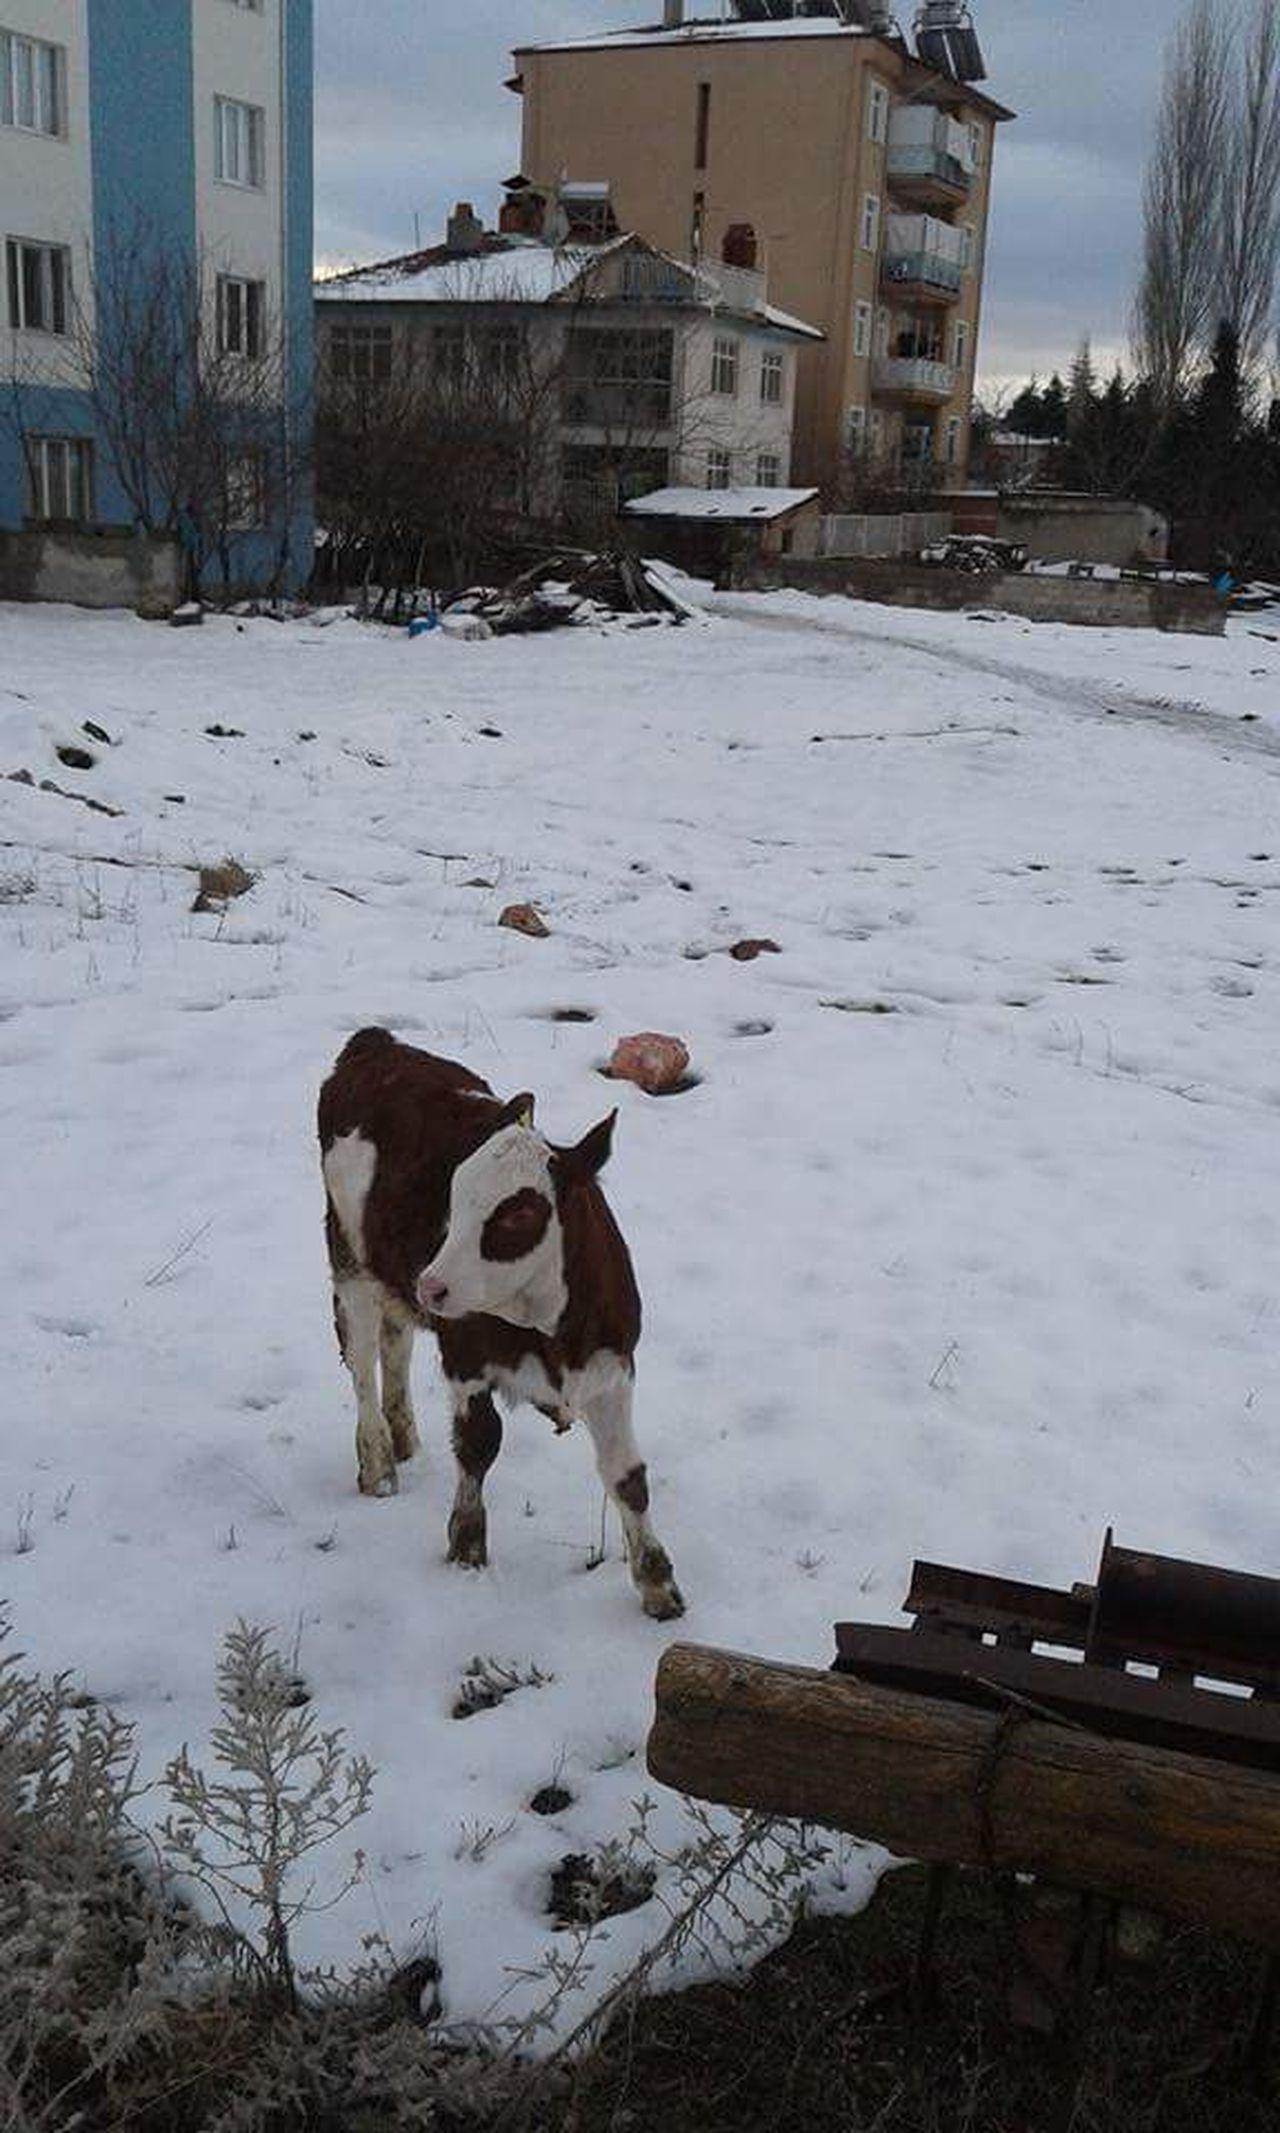 Animal One Animal Animal Themes Domestic Animals Snow Gununkaresi Kütahyalı Hello World First Eyem Photo Turkey Kütahya Sogukhavaa ❄️❄️ Animals In The Wild Turkey💕 Emet